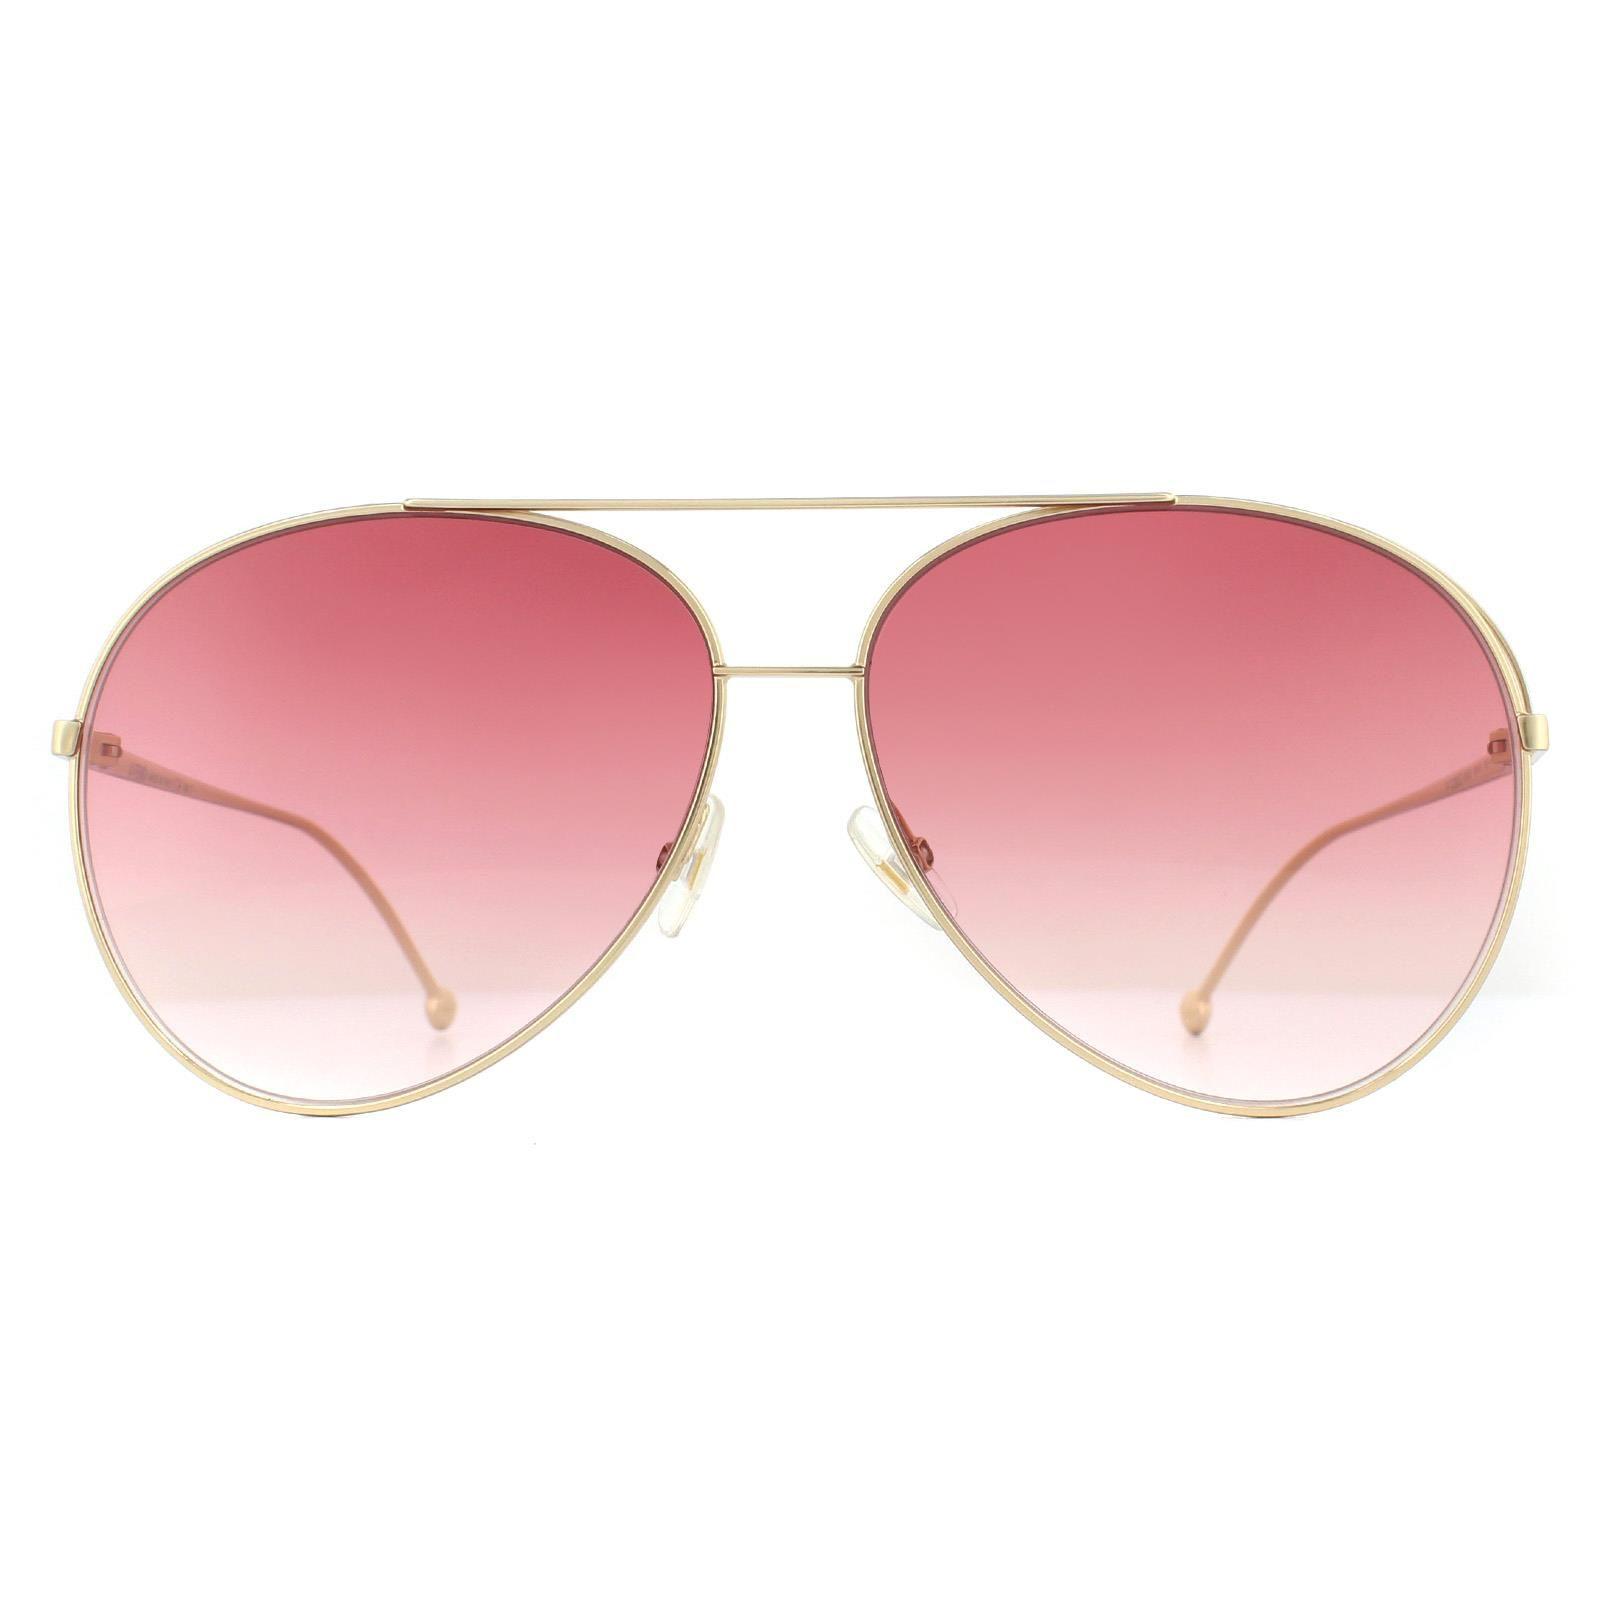 Fendi Sunglasses FF 0286/S 000 3X Rose Gold Pink Gradient